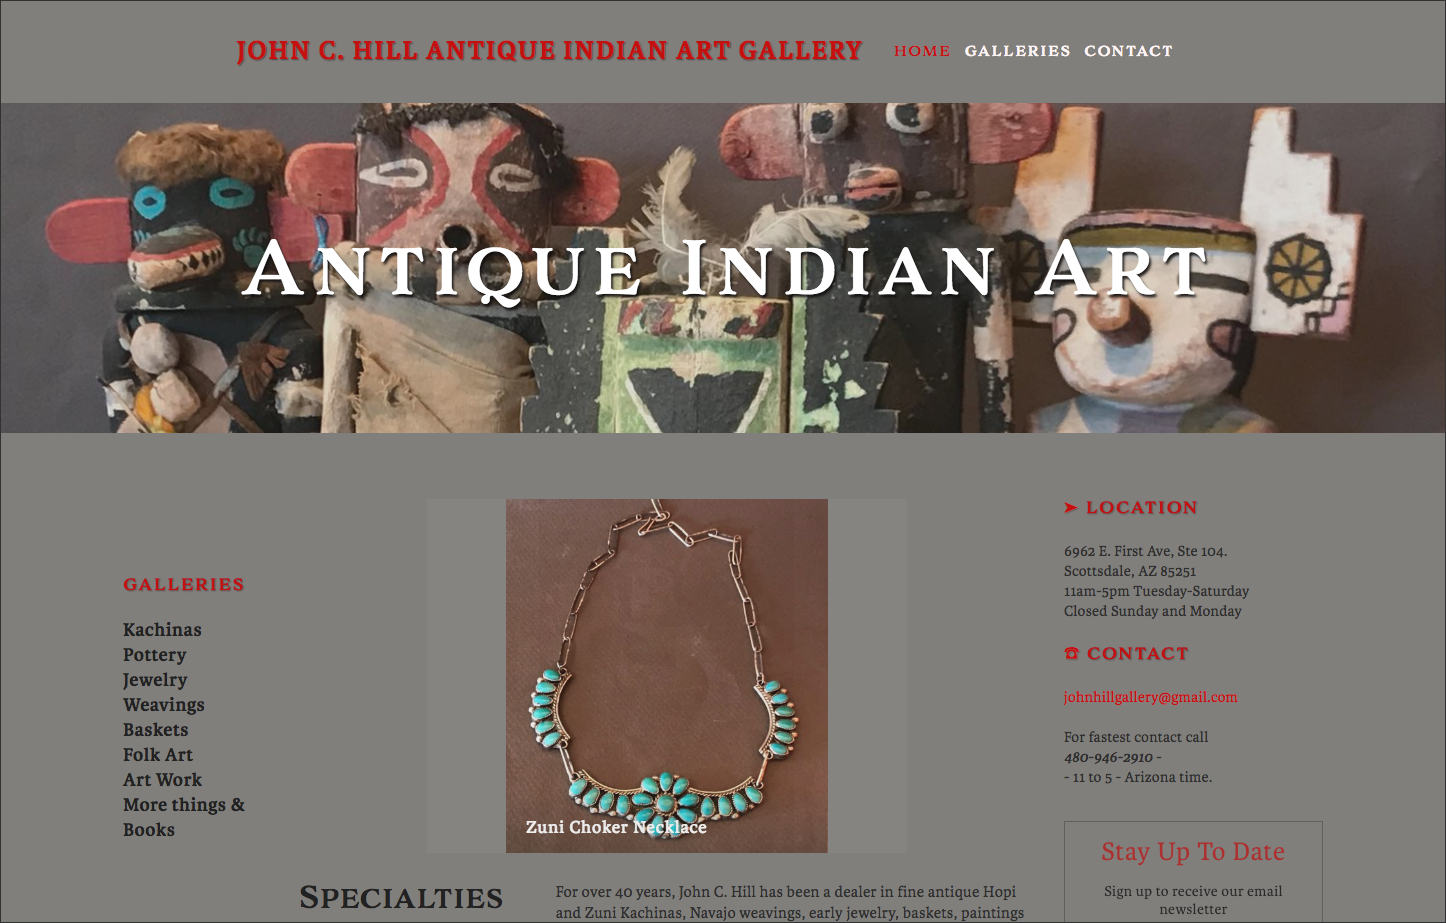 David Ezziddine - John C  Hill Antique Indian Art Gallery